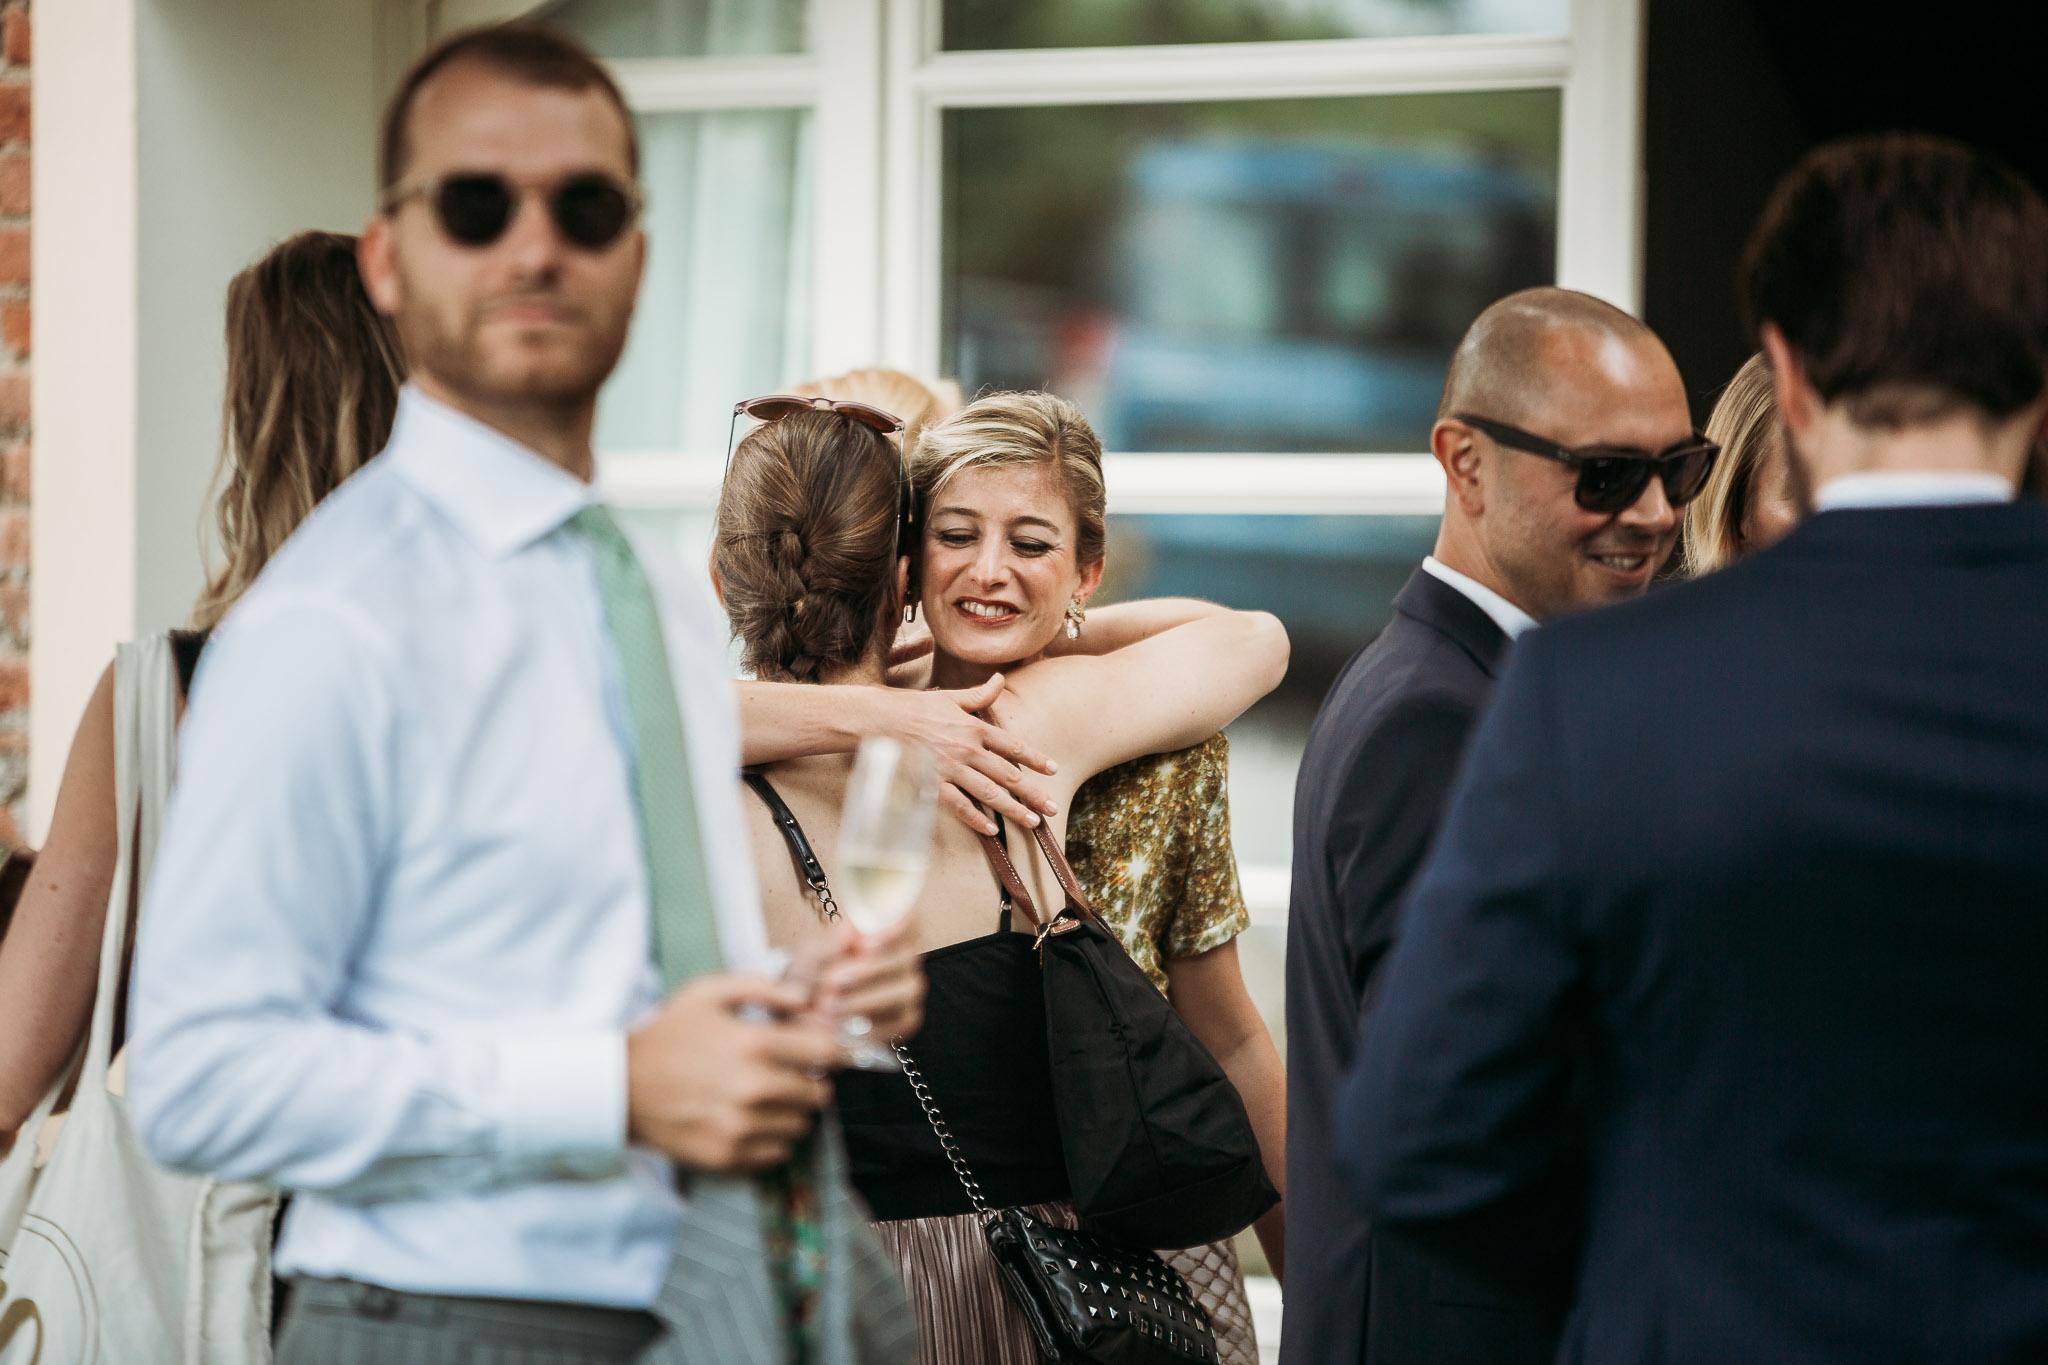 Wedding guests arriving at La Villa Hotel, Mombaruzzo